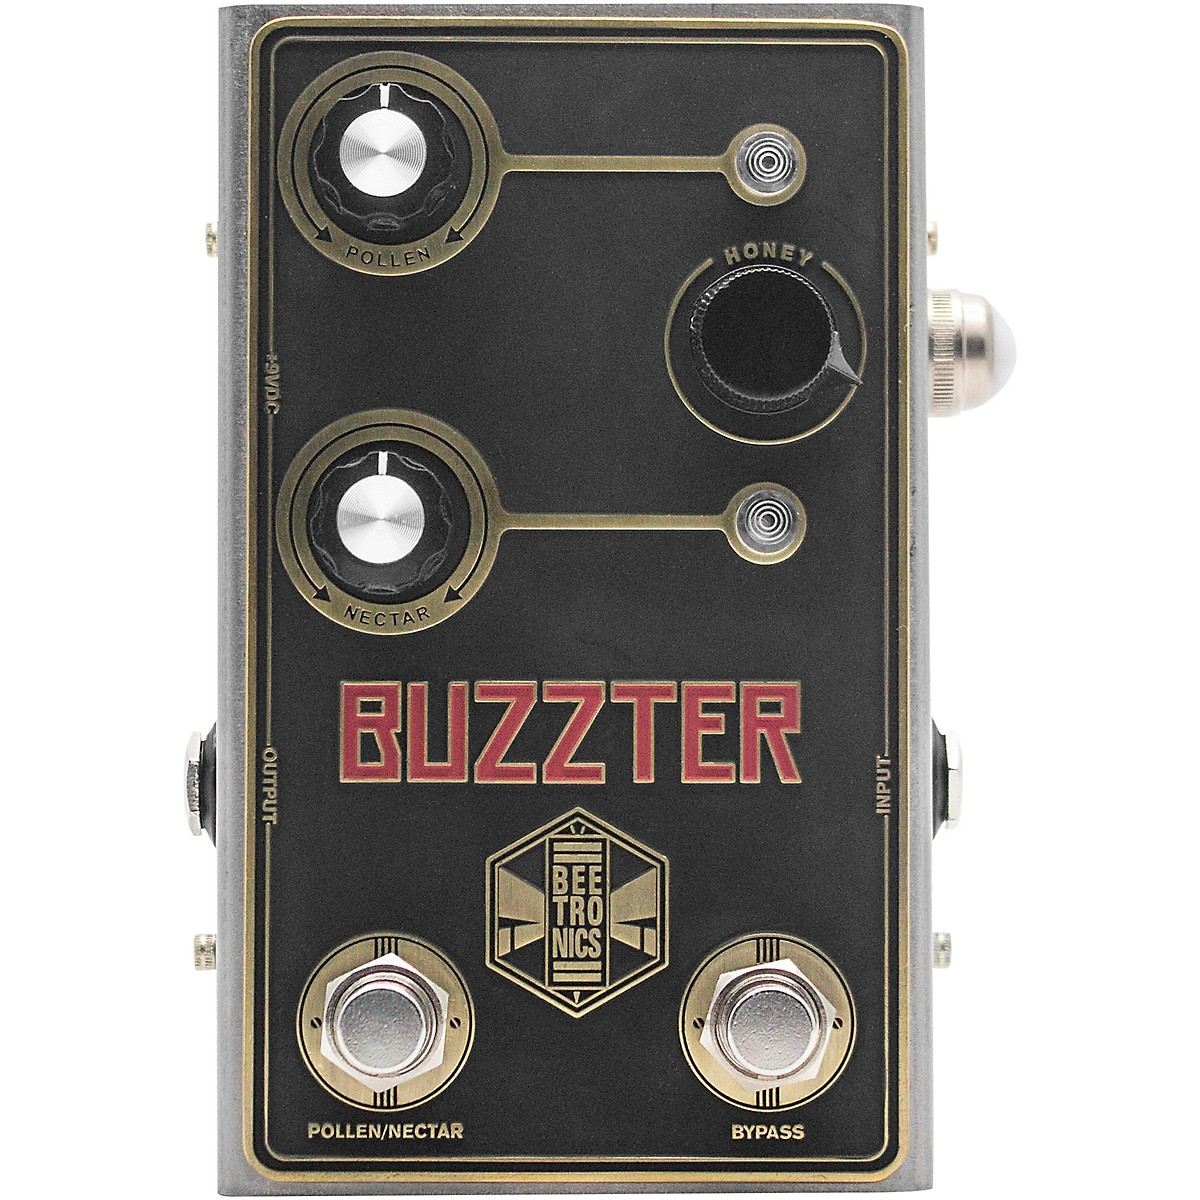 Beetronics FX Buzzter Royal Series Boost Effects Pedal